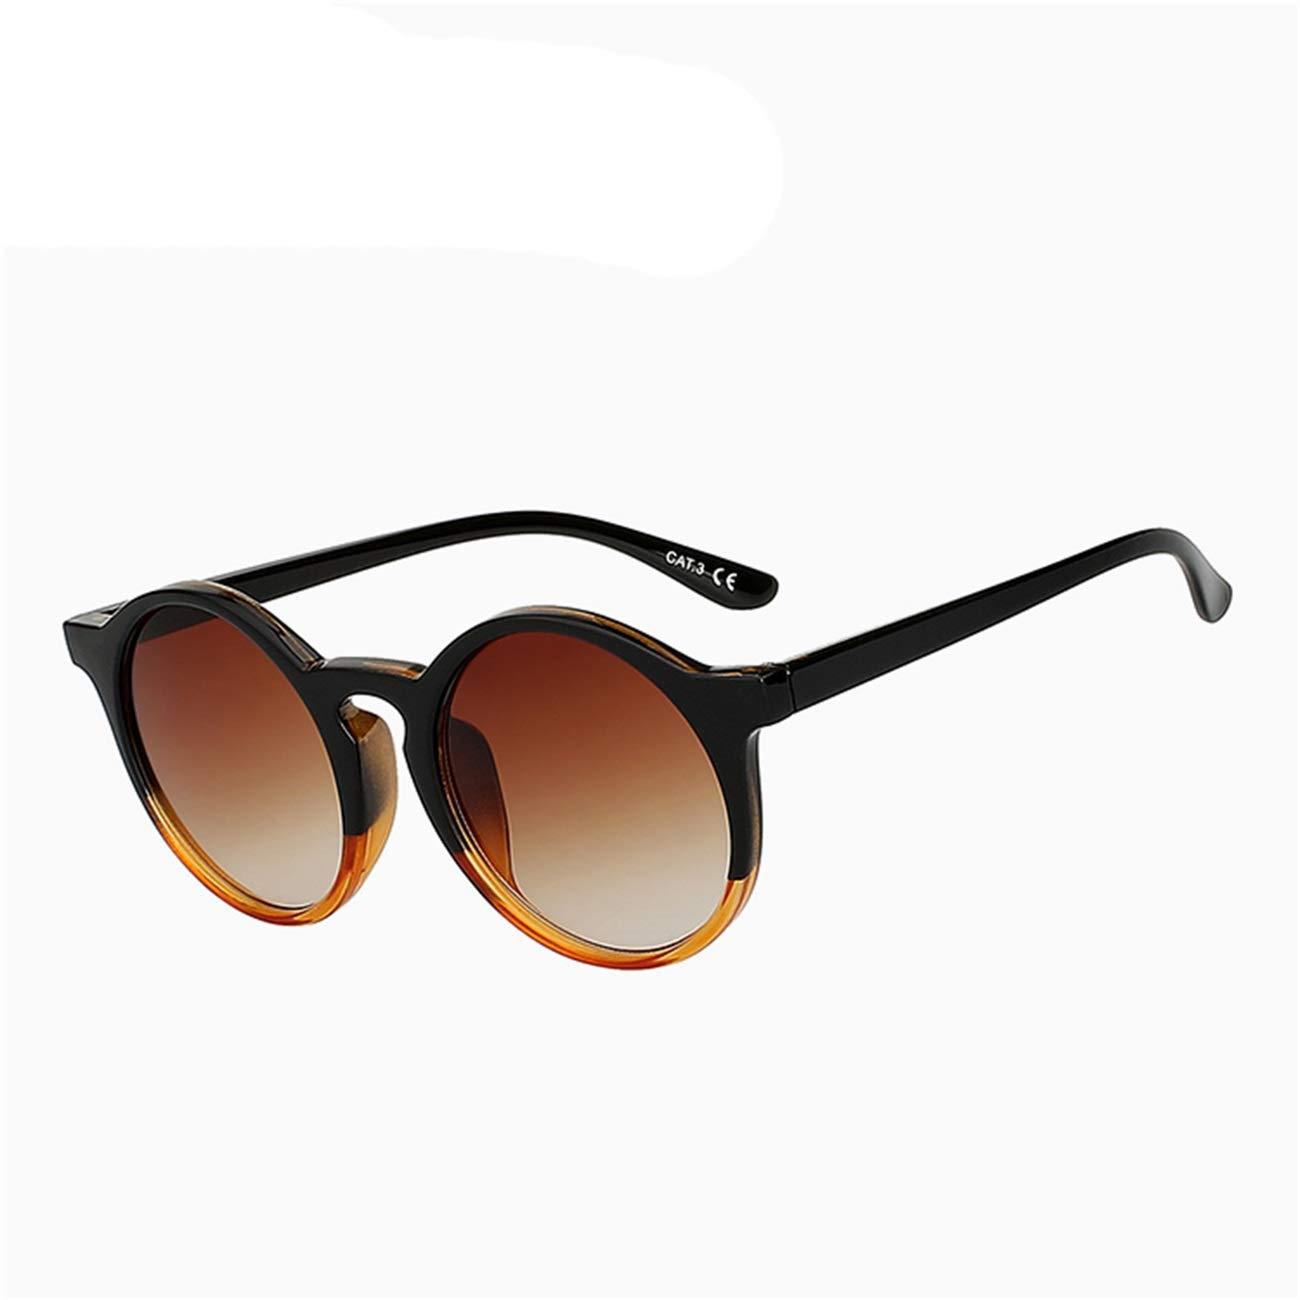 Amazon.com: Bnialaed Oversized Round Sunglasses Women ...